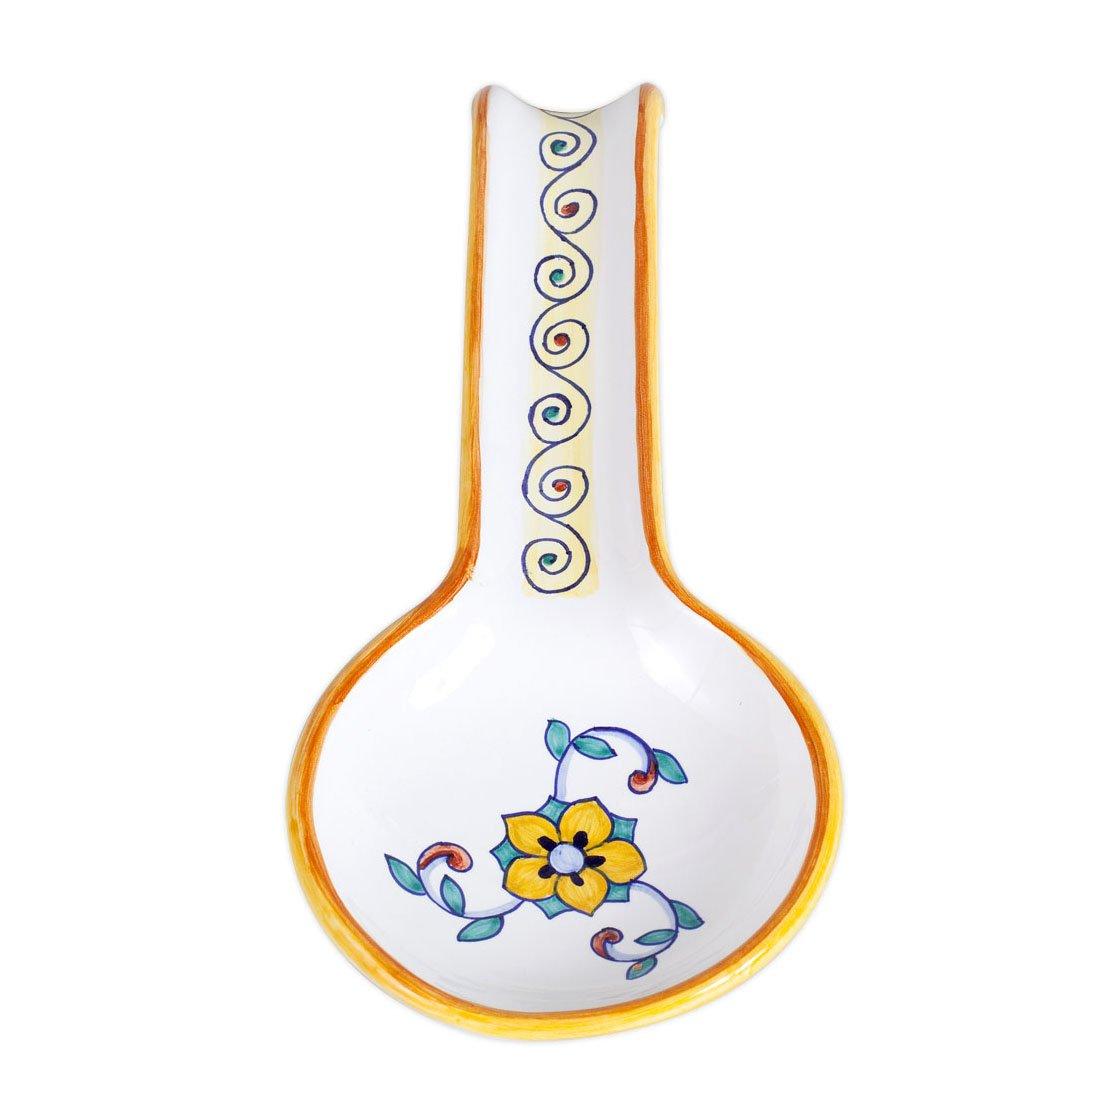 Deruta Hand Painted Primavera Ceramic Spoonrest From Italy by Deruta Primavera